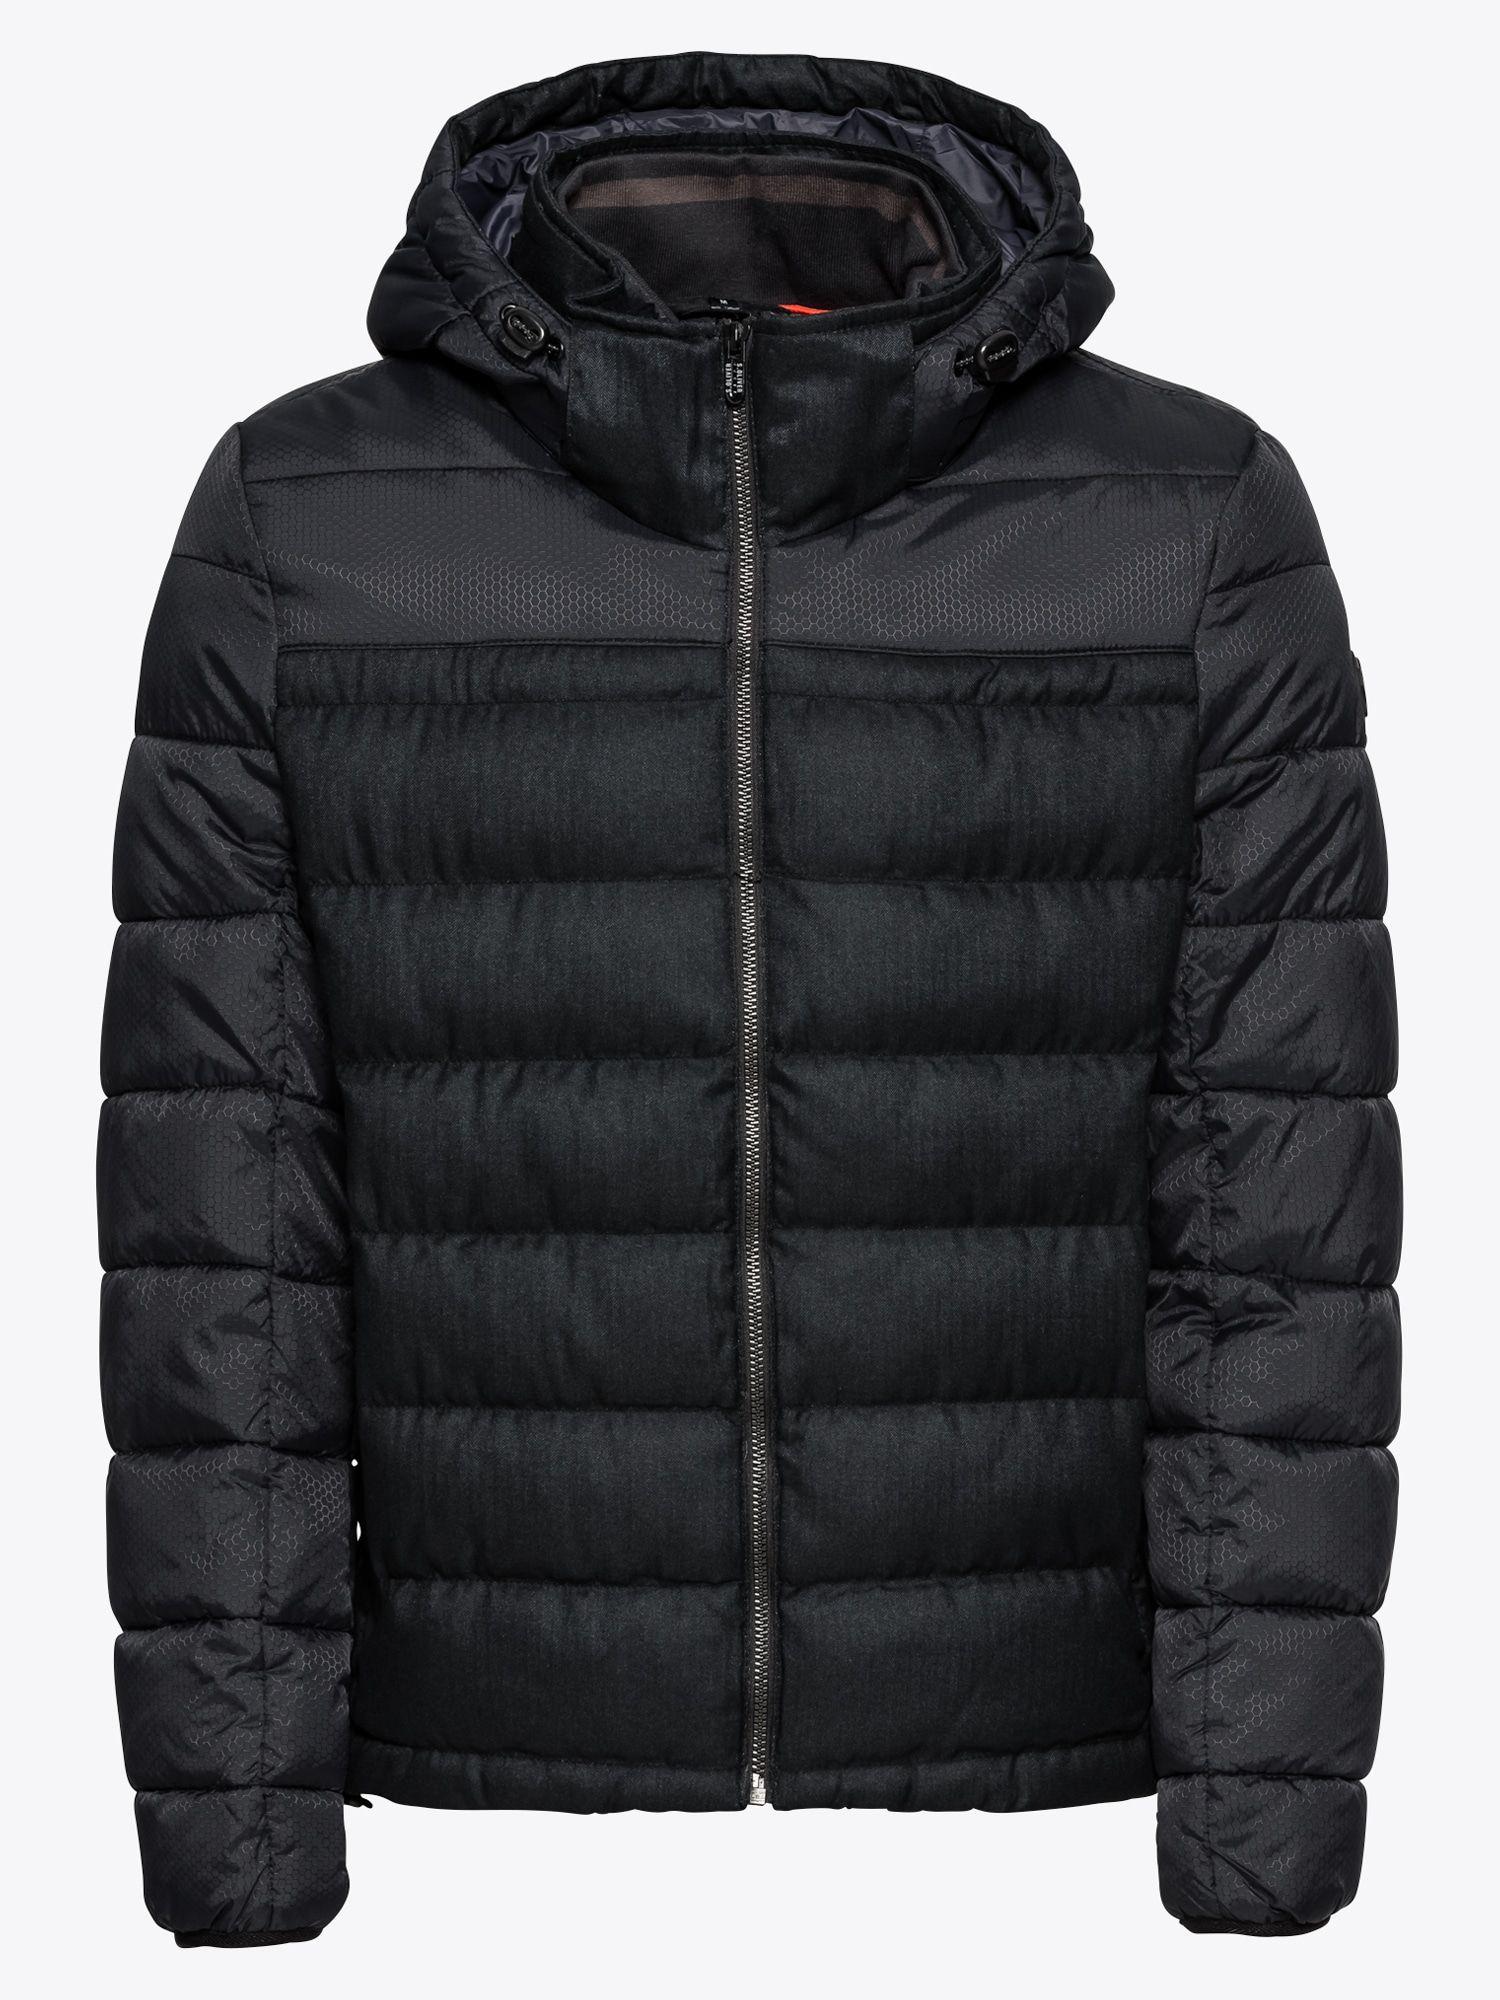 S Oliver Steppjacke Outdoor Jacke Herren Schwarz Grosse M Outdoor Jacken Herren Jacken Und Schwarze Regenjacke